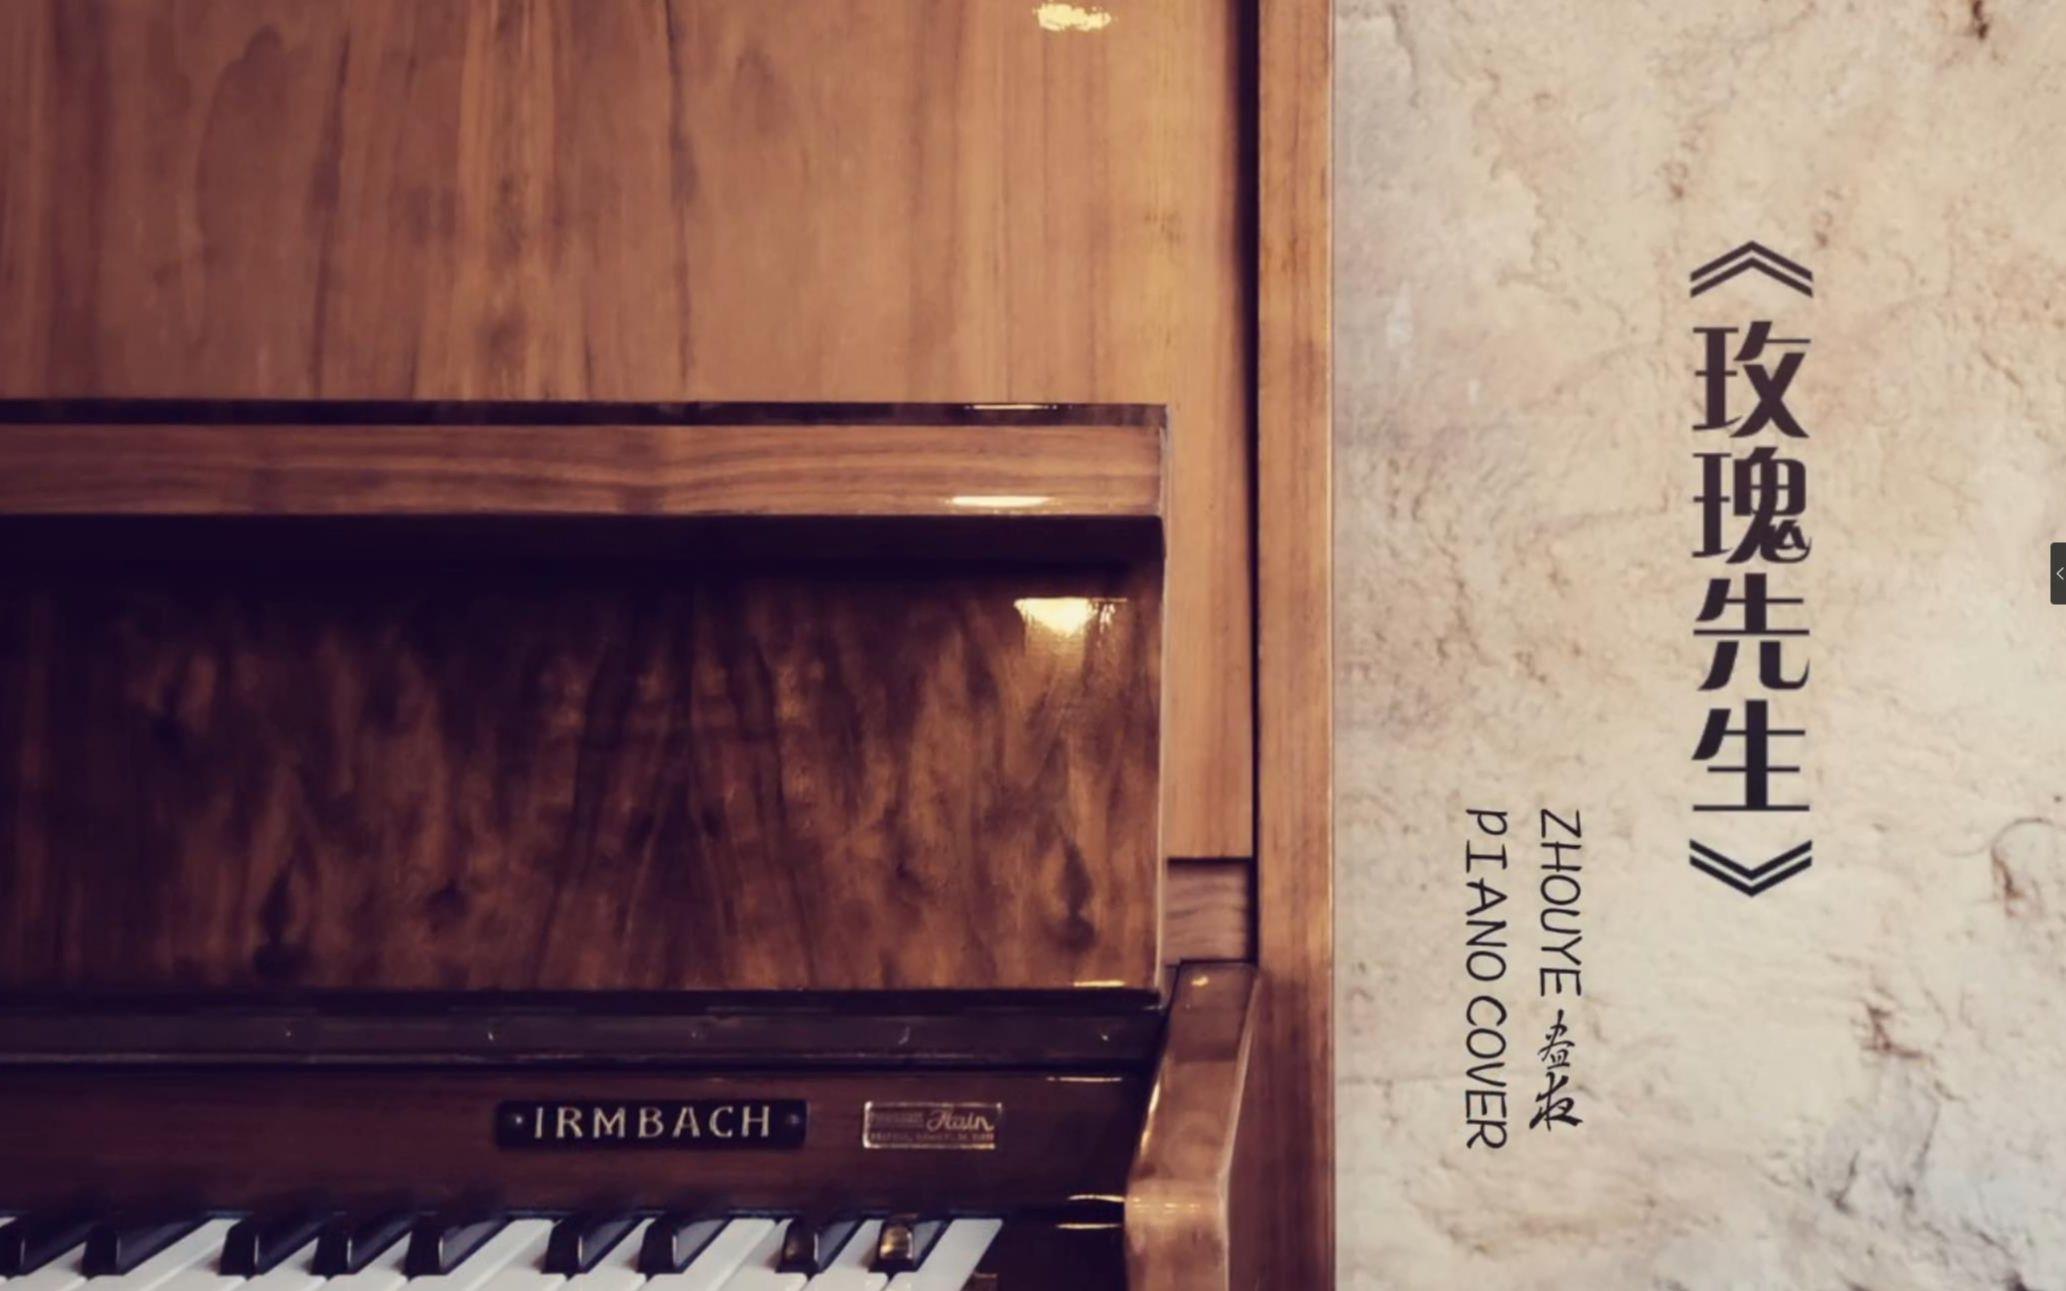 玫瑰先生 ——广播剧《碎玉投珠》主题曲钢琴版翻弹_哔哩哔哩 (゜-゜)つロ 干杯~-bilibili